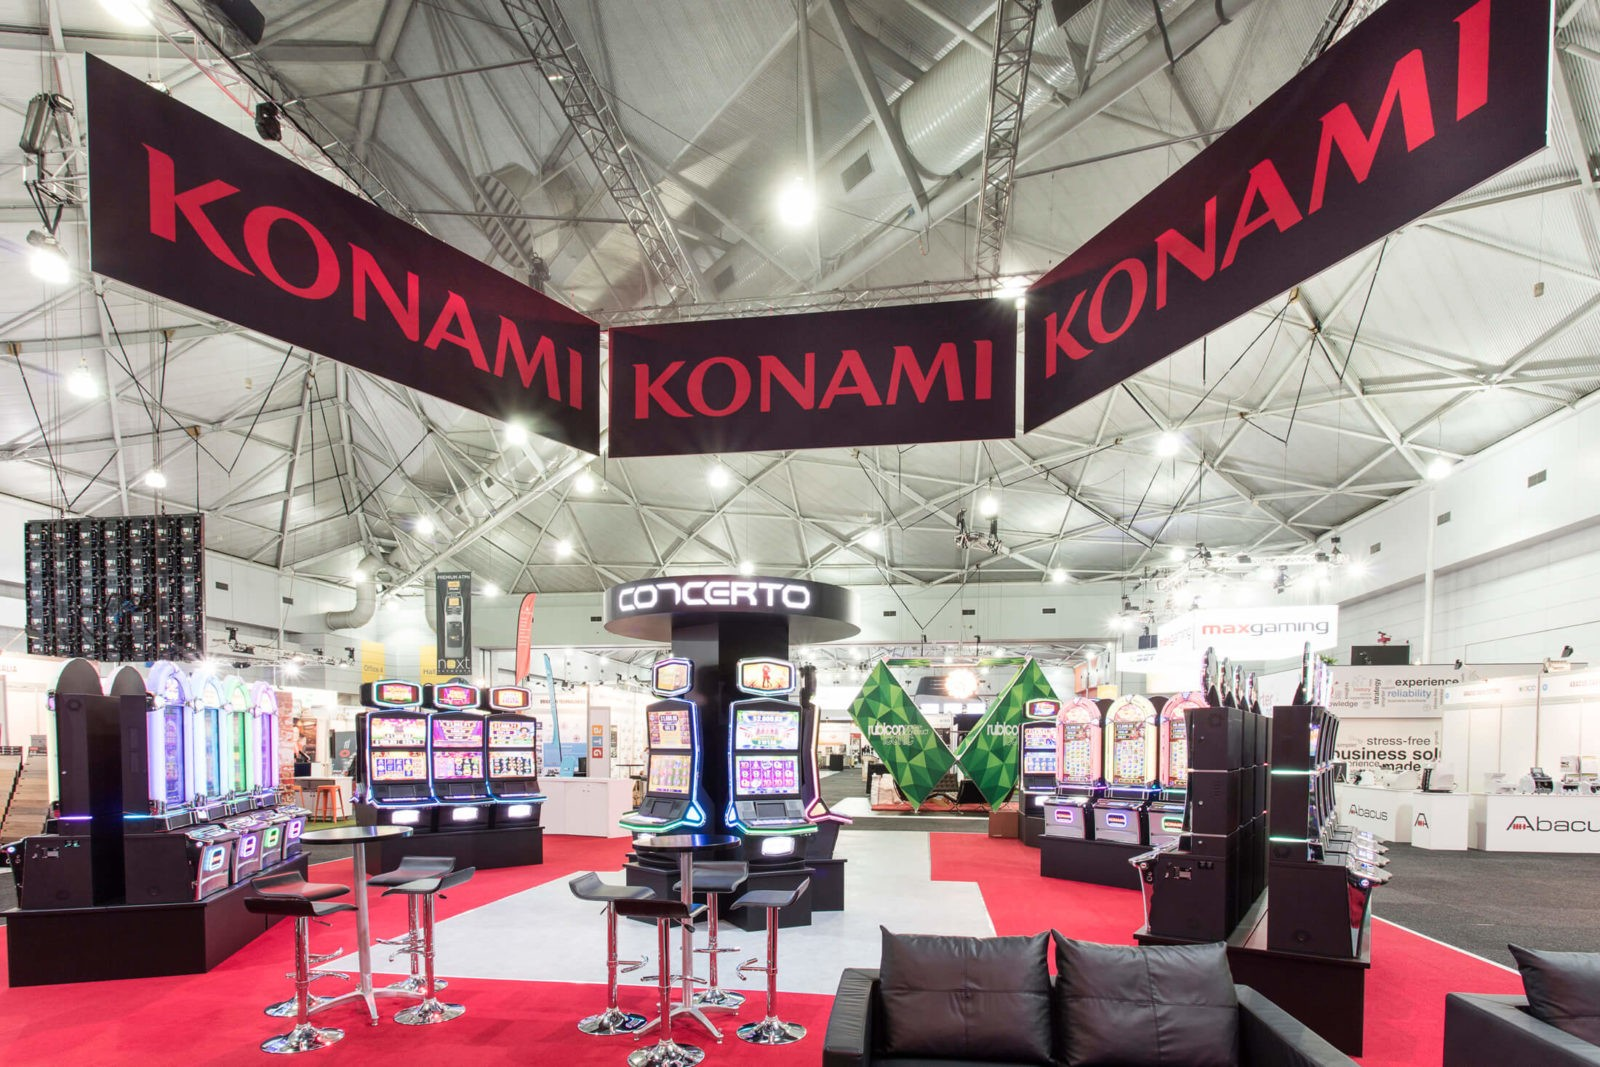 Konami_highres-9